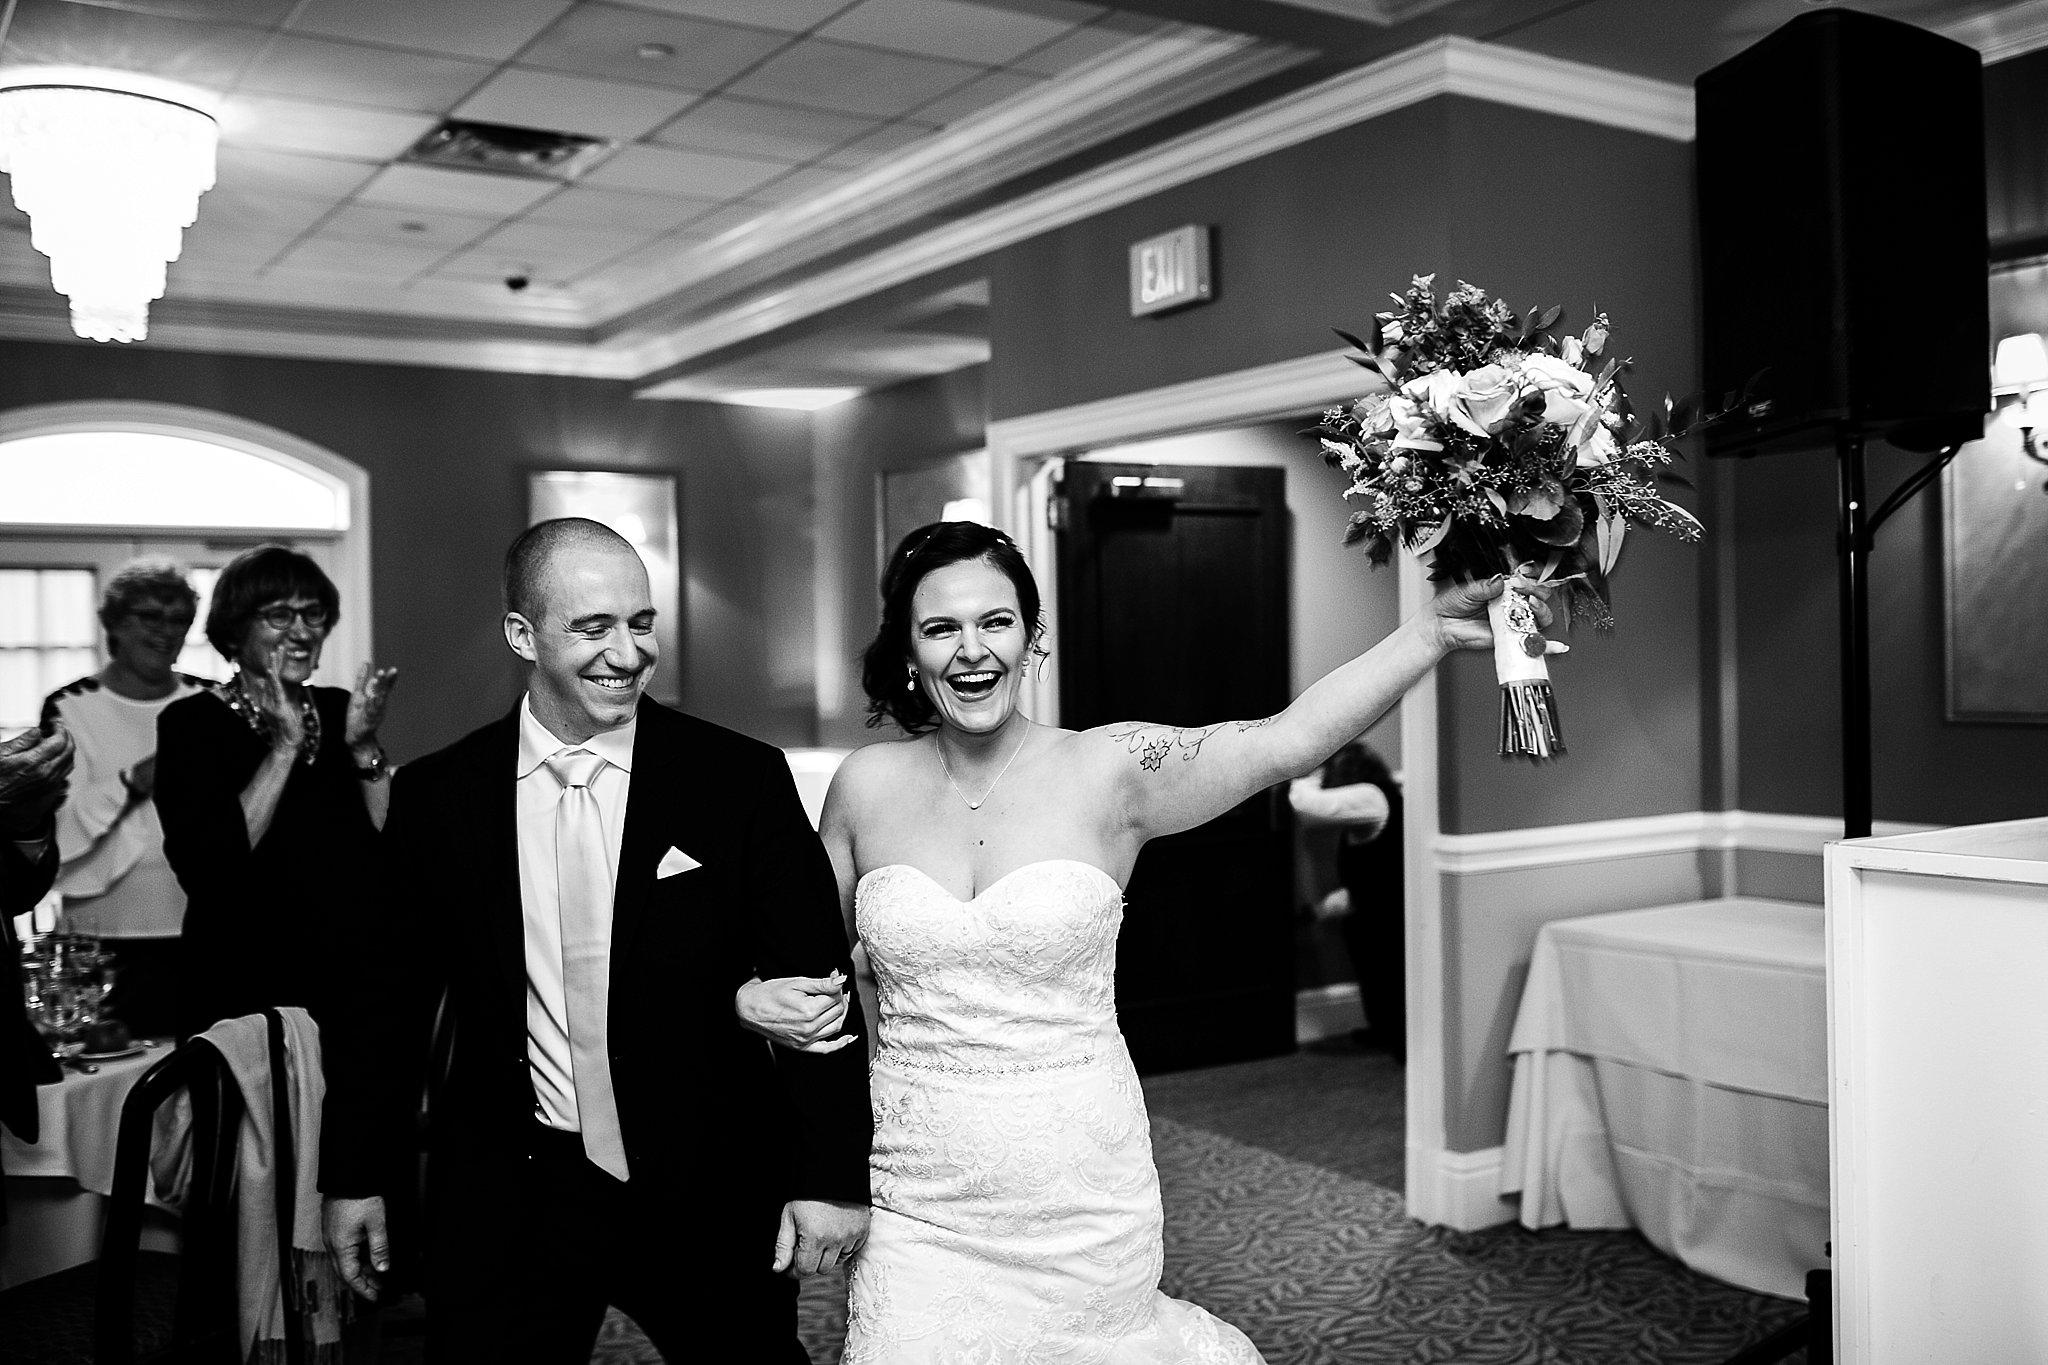 Links at Unionvale Wedding Lagrangeville Wedding Hudson Valley Wedding Photographer Sweet Alice Photography63.jpg